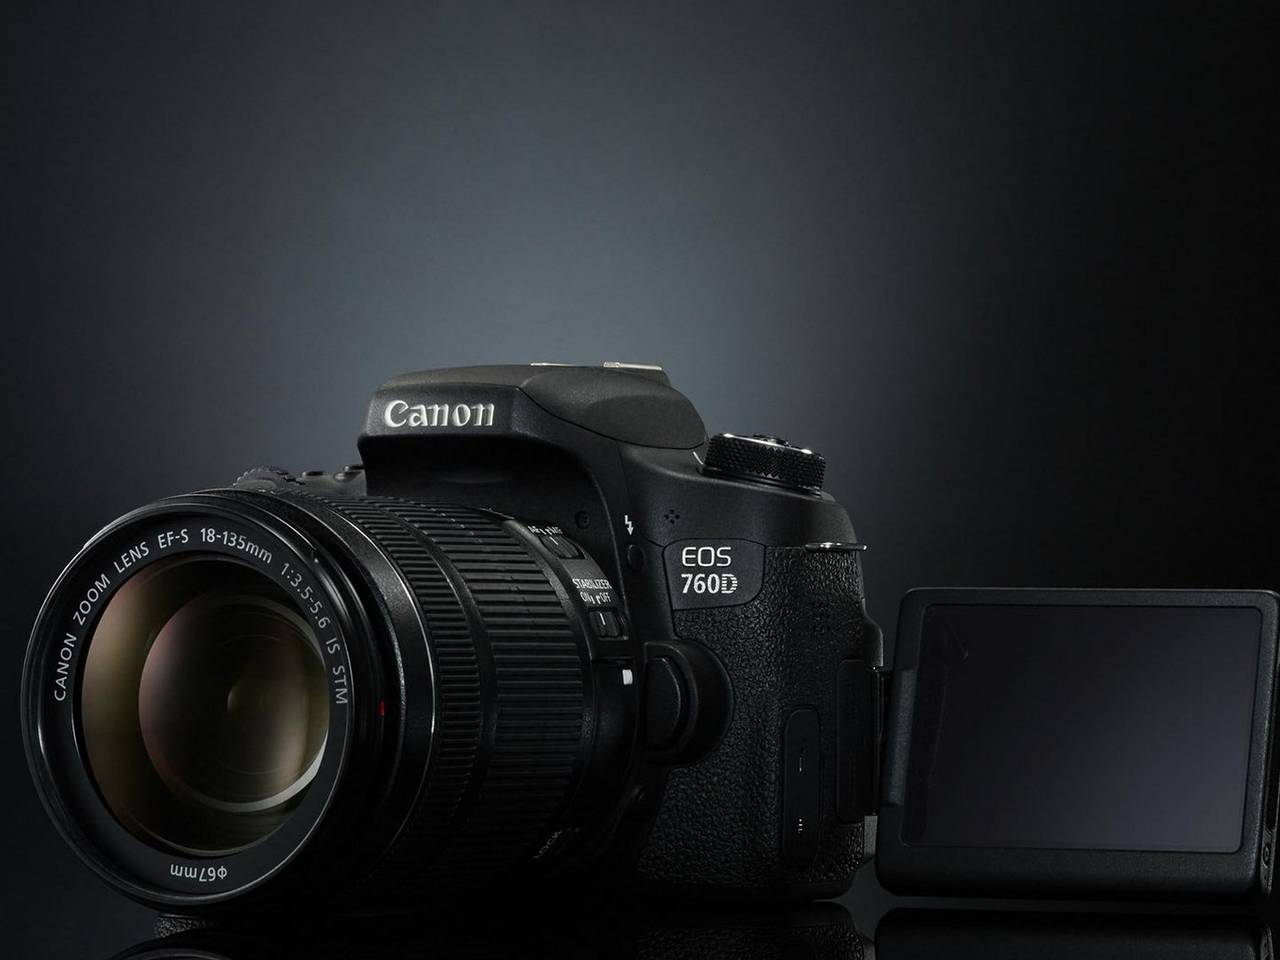 Eos Systemkameror Fr Nybrjare Canon Svenska 800d Kit 18 135mm Is Stm Paket Home Photo Printers Pixma Mg7750 Open